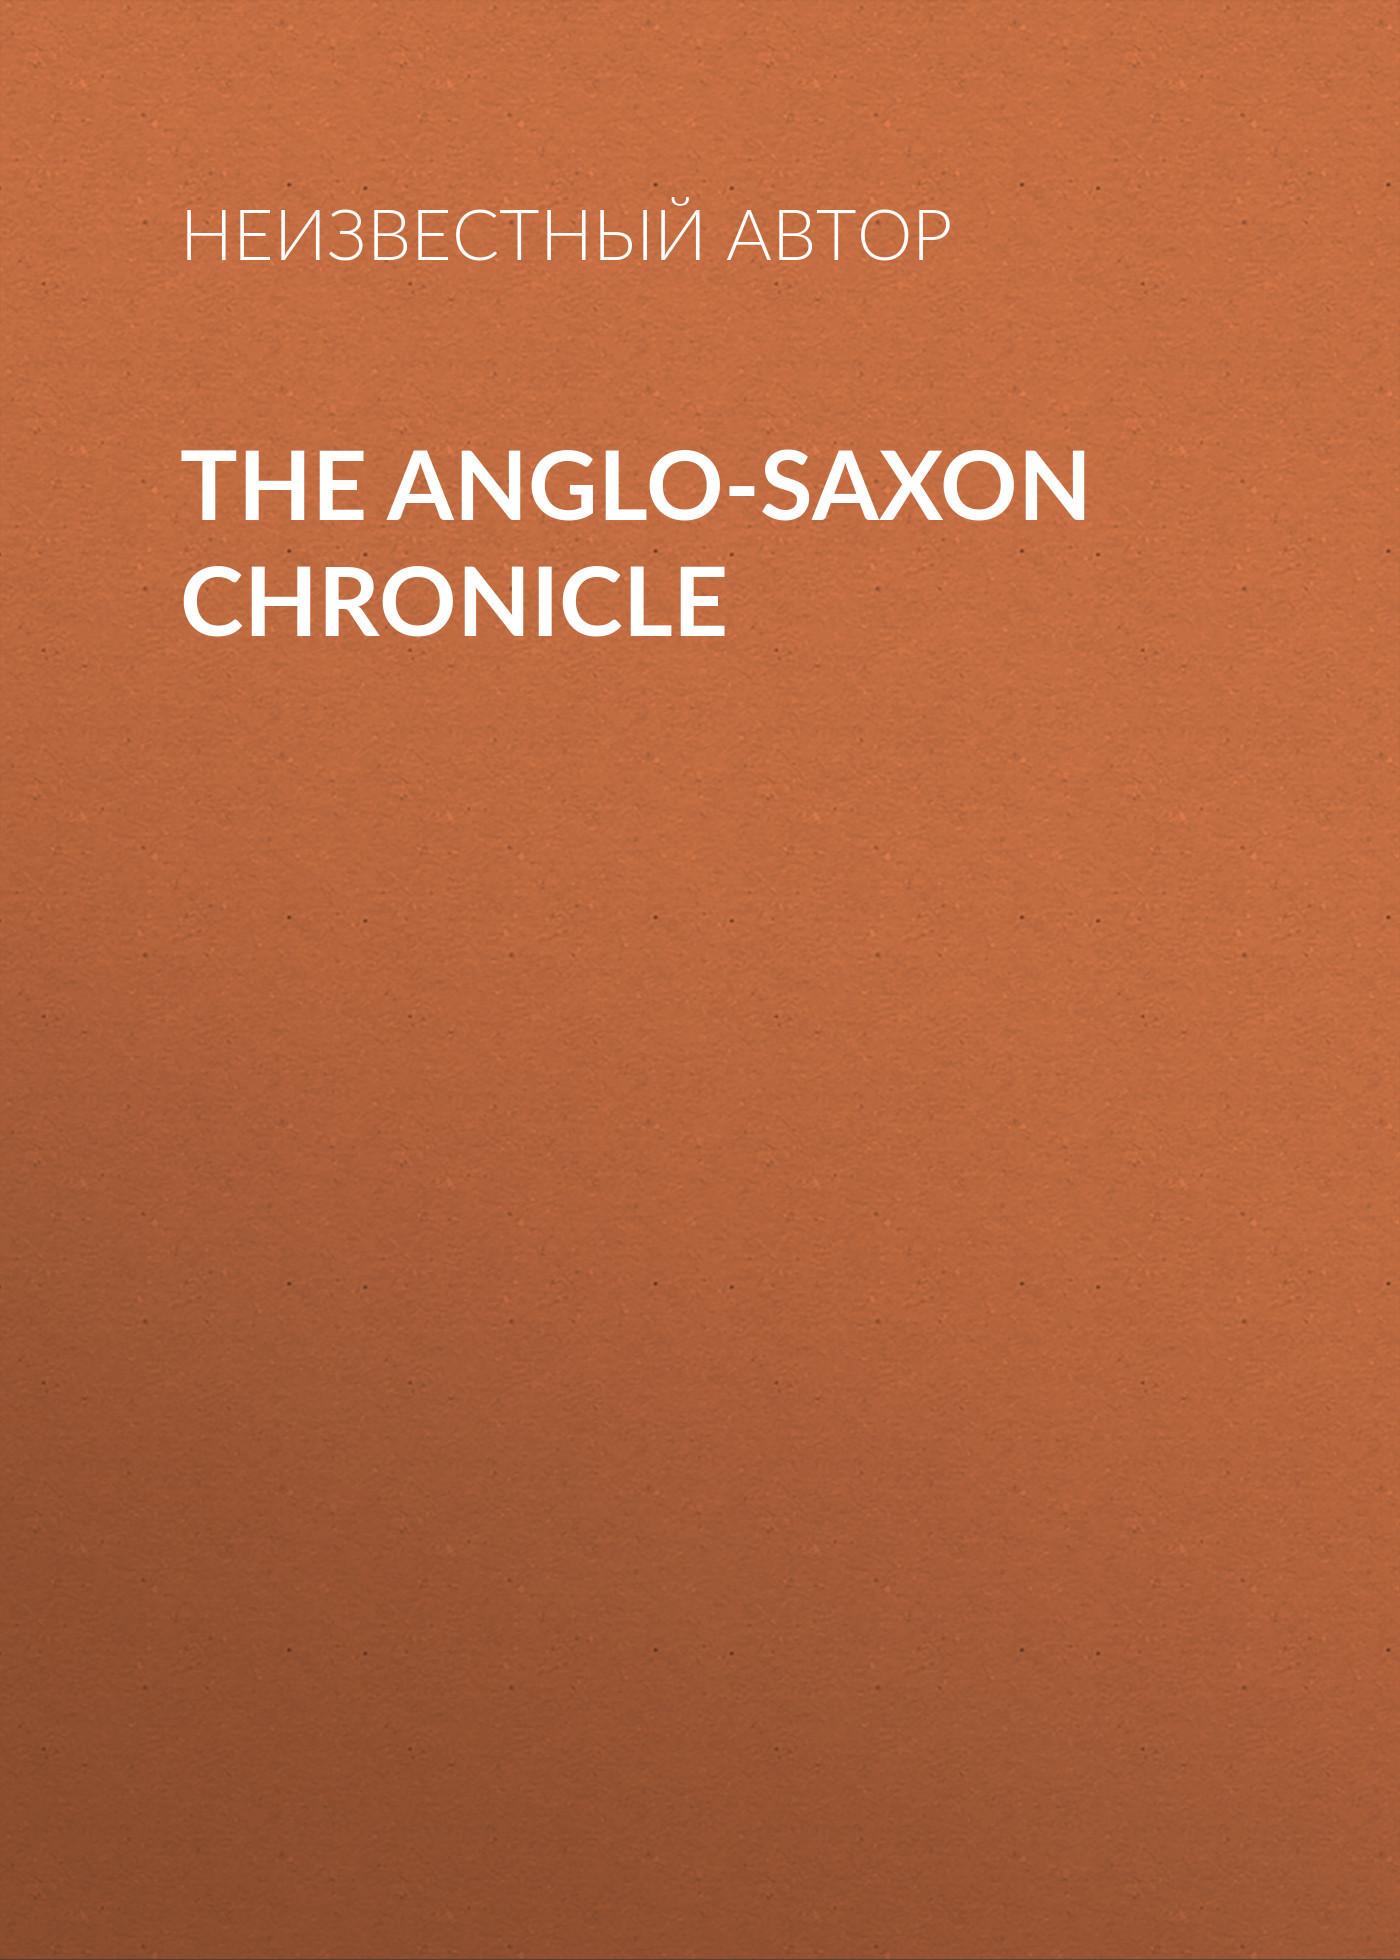 Неизвестный автор The Anglo-Saxon Chronicle андрей геннадиевич демидов natotevaal war chronicle